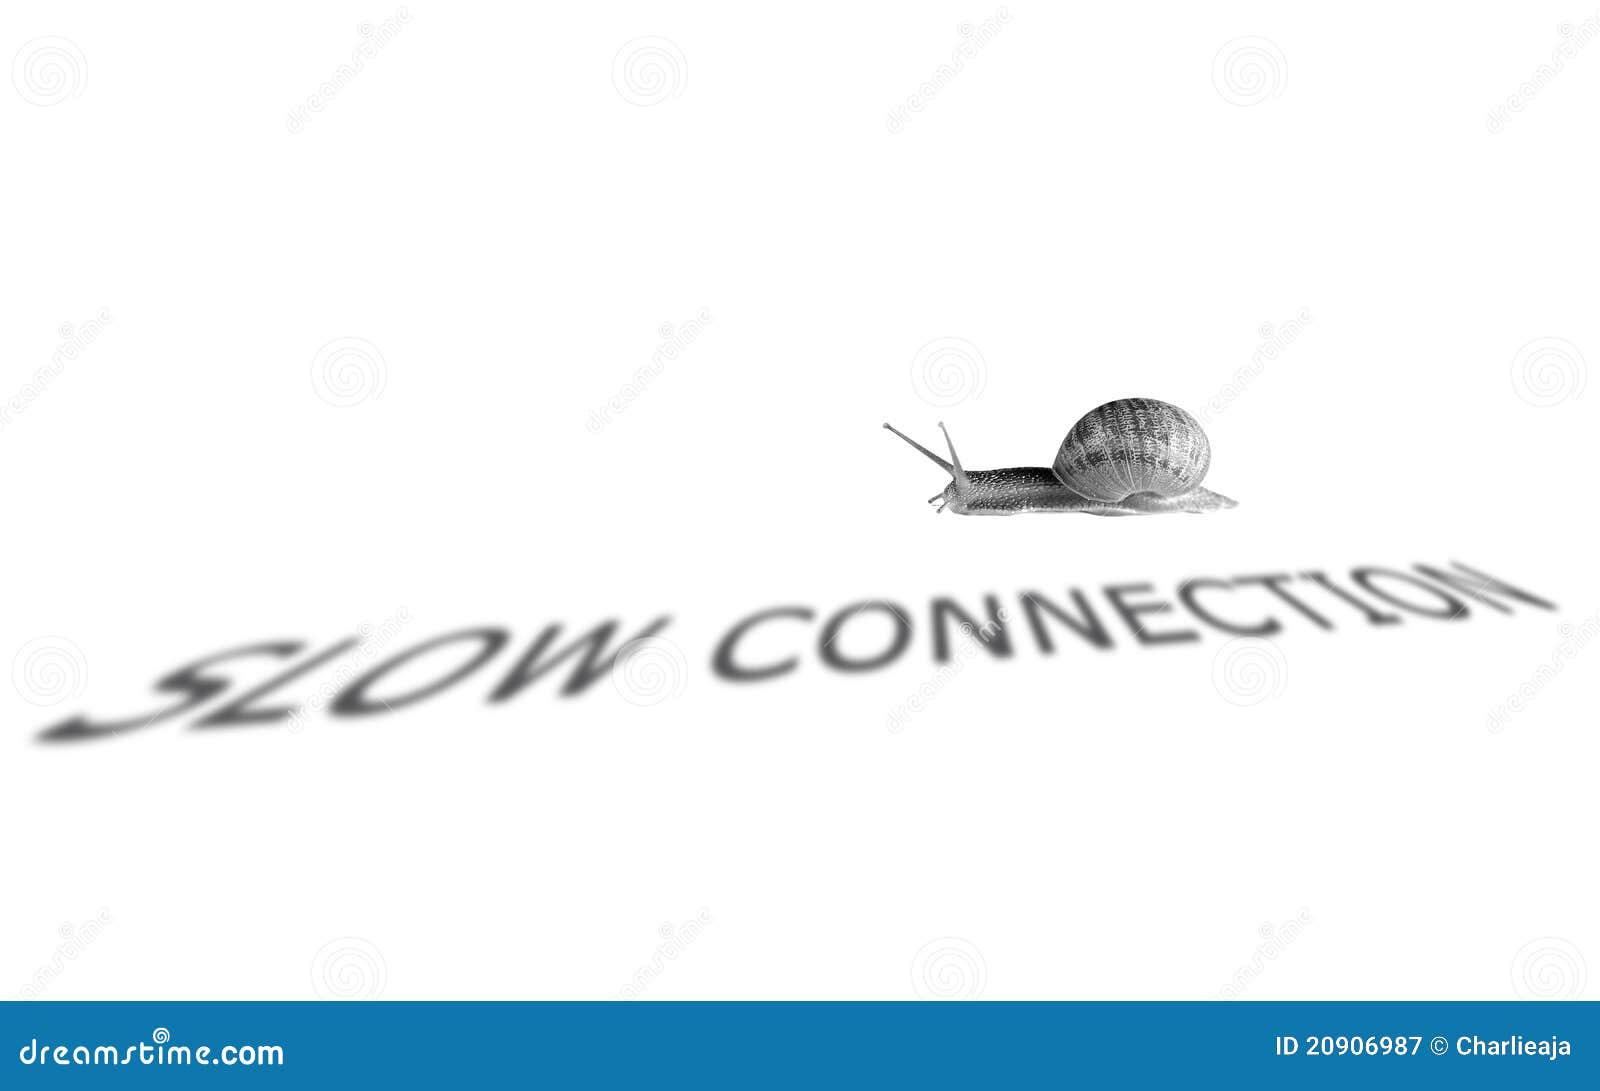 internet connection  internet connection is slow